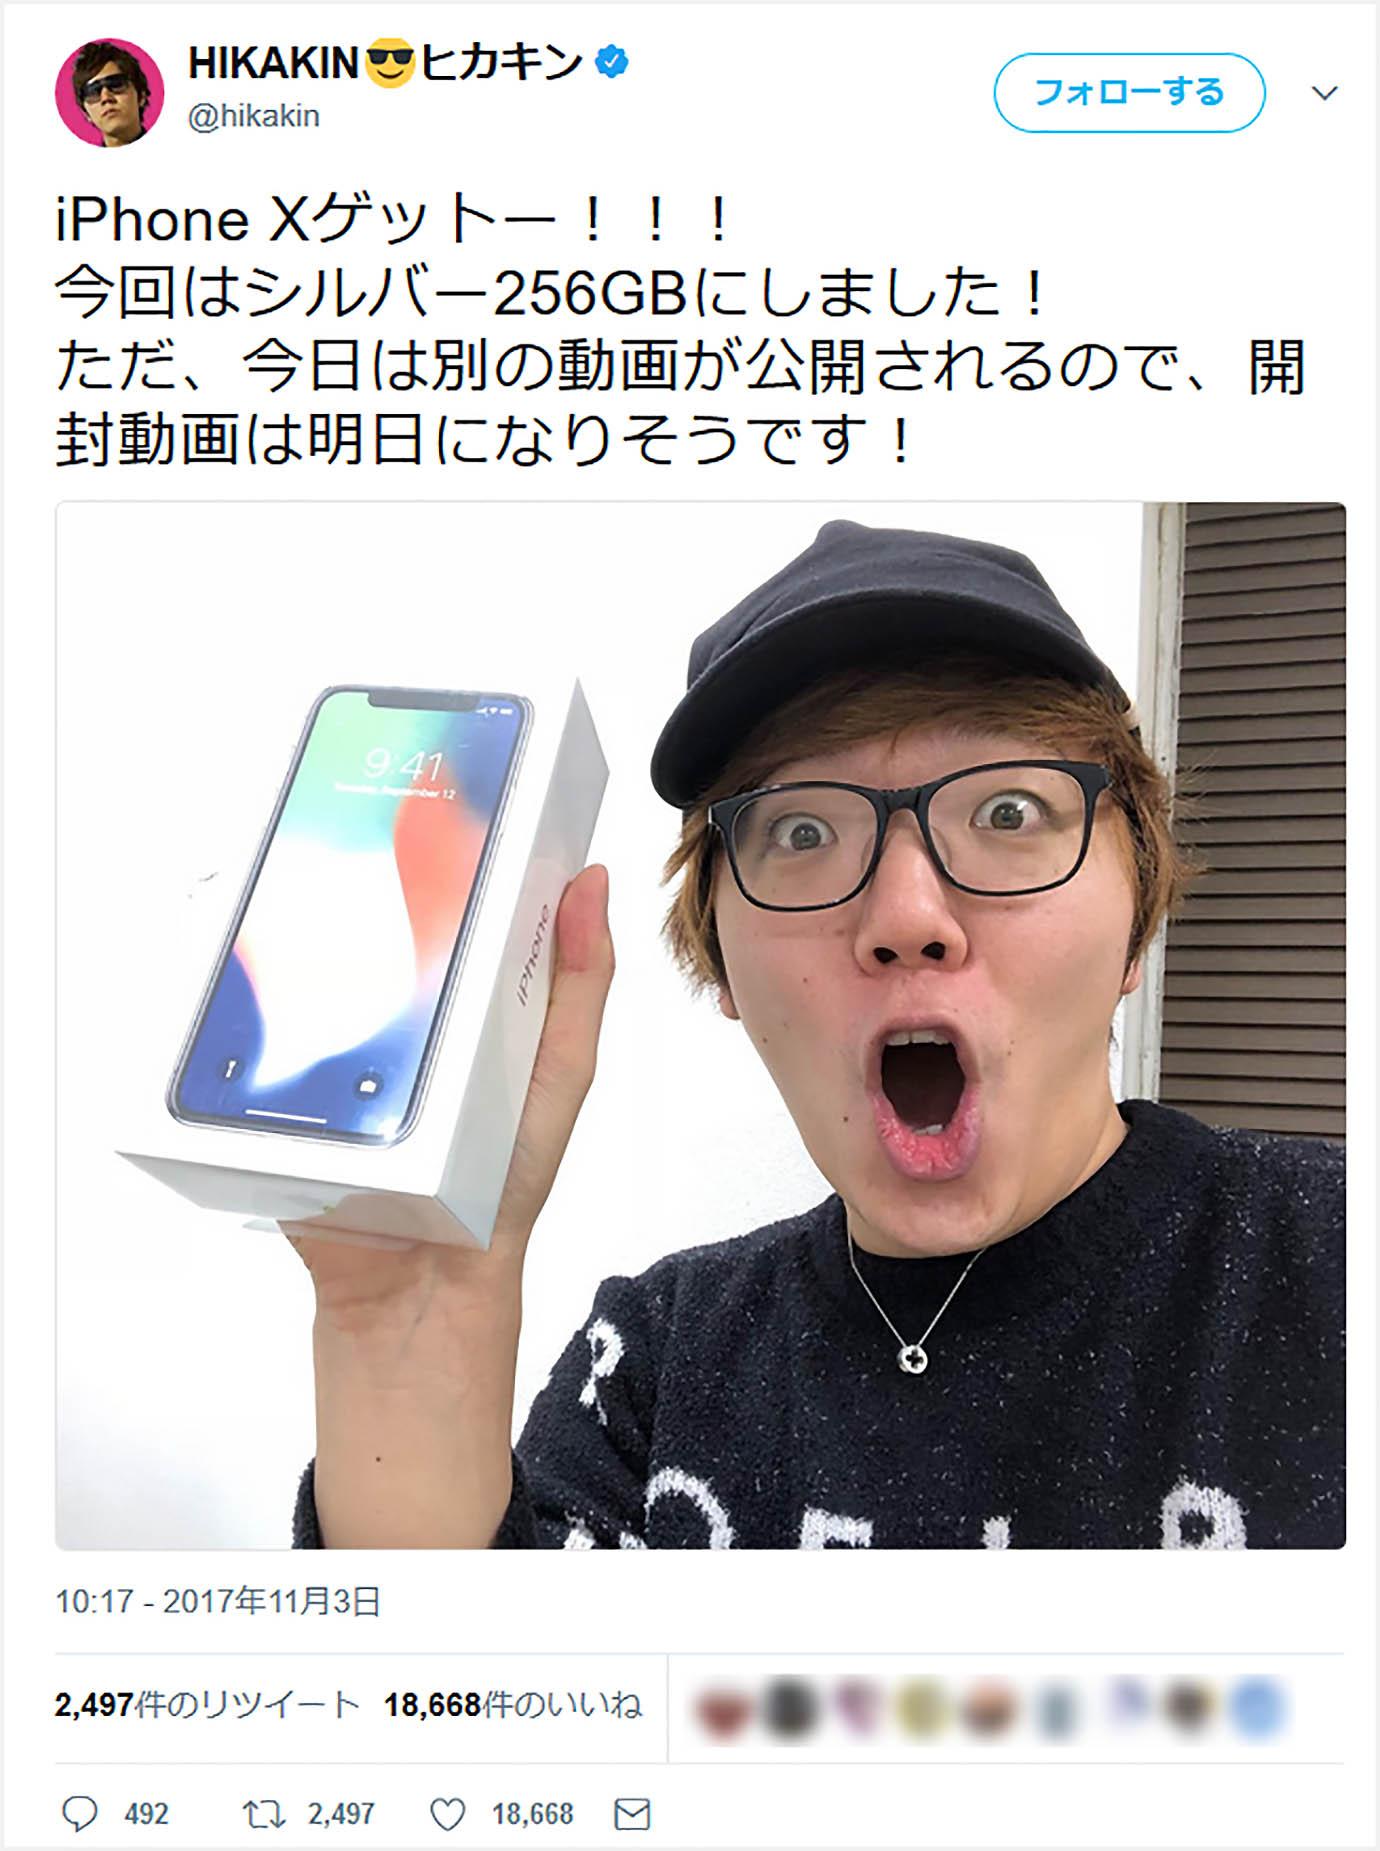 hikakin-iphone-x-get